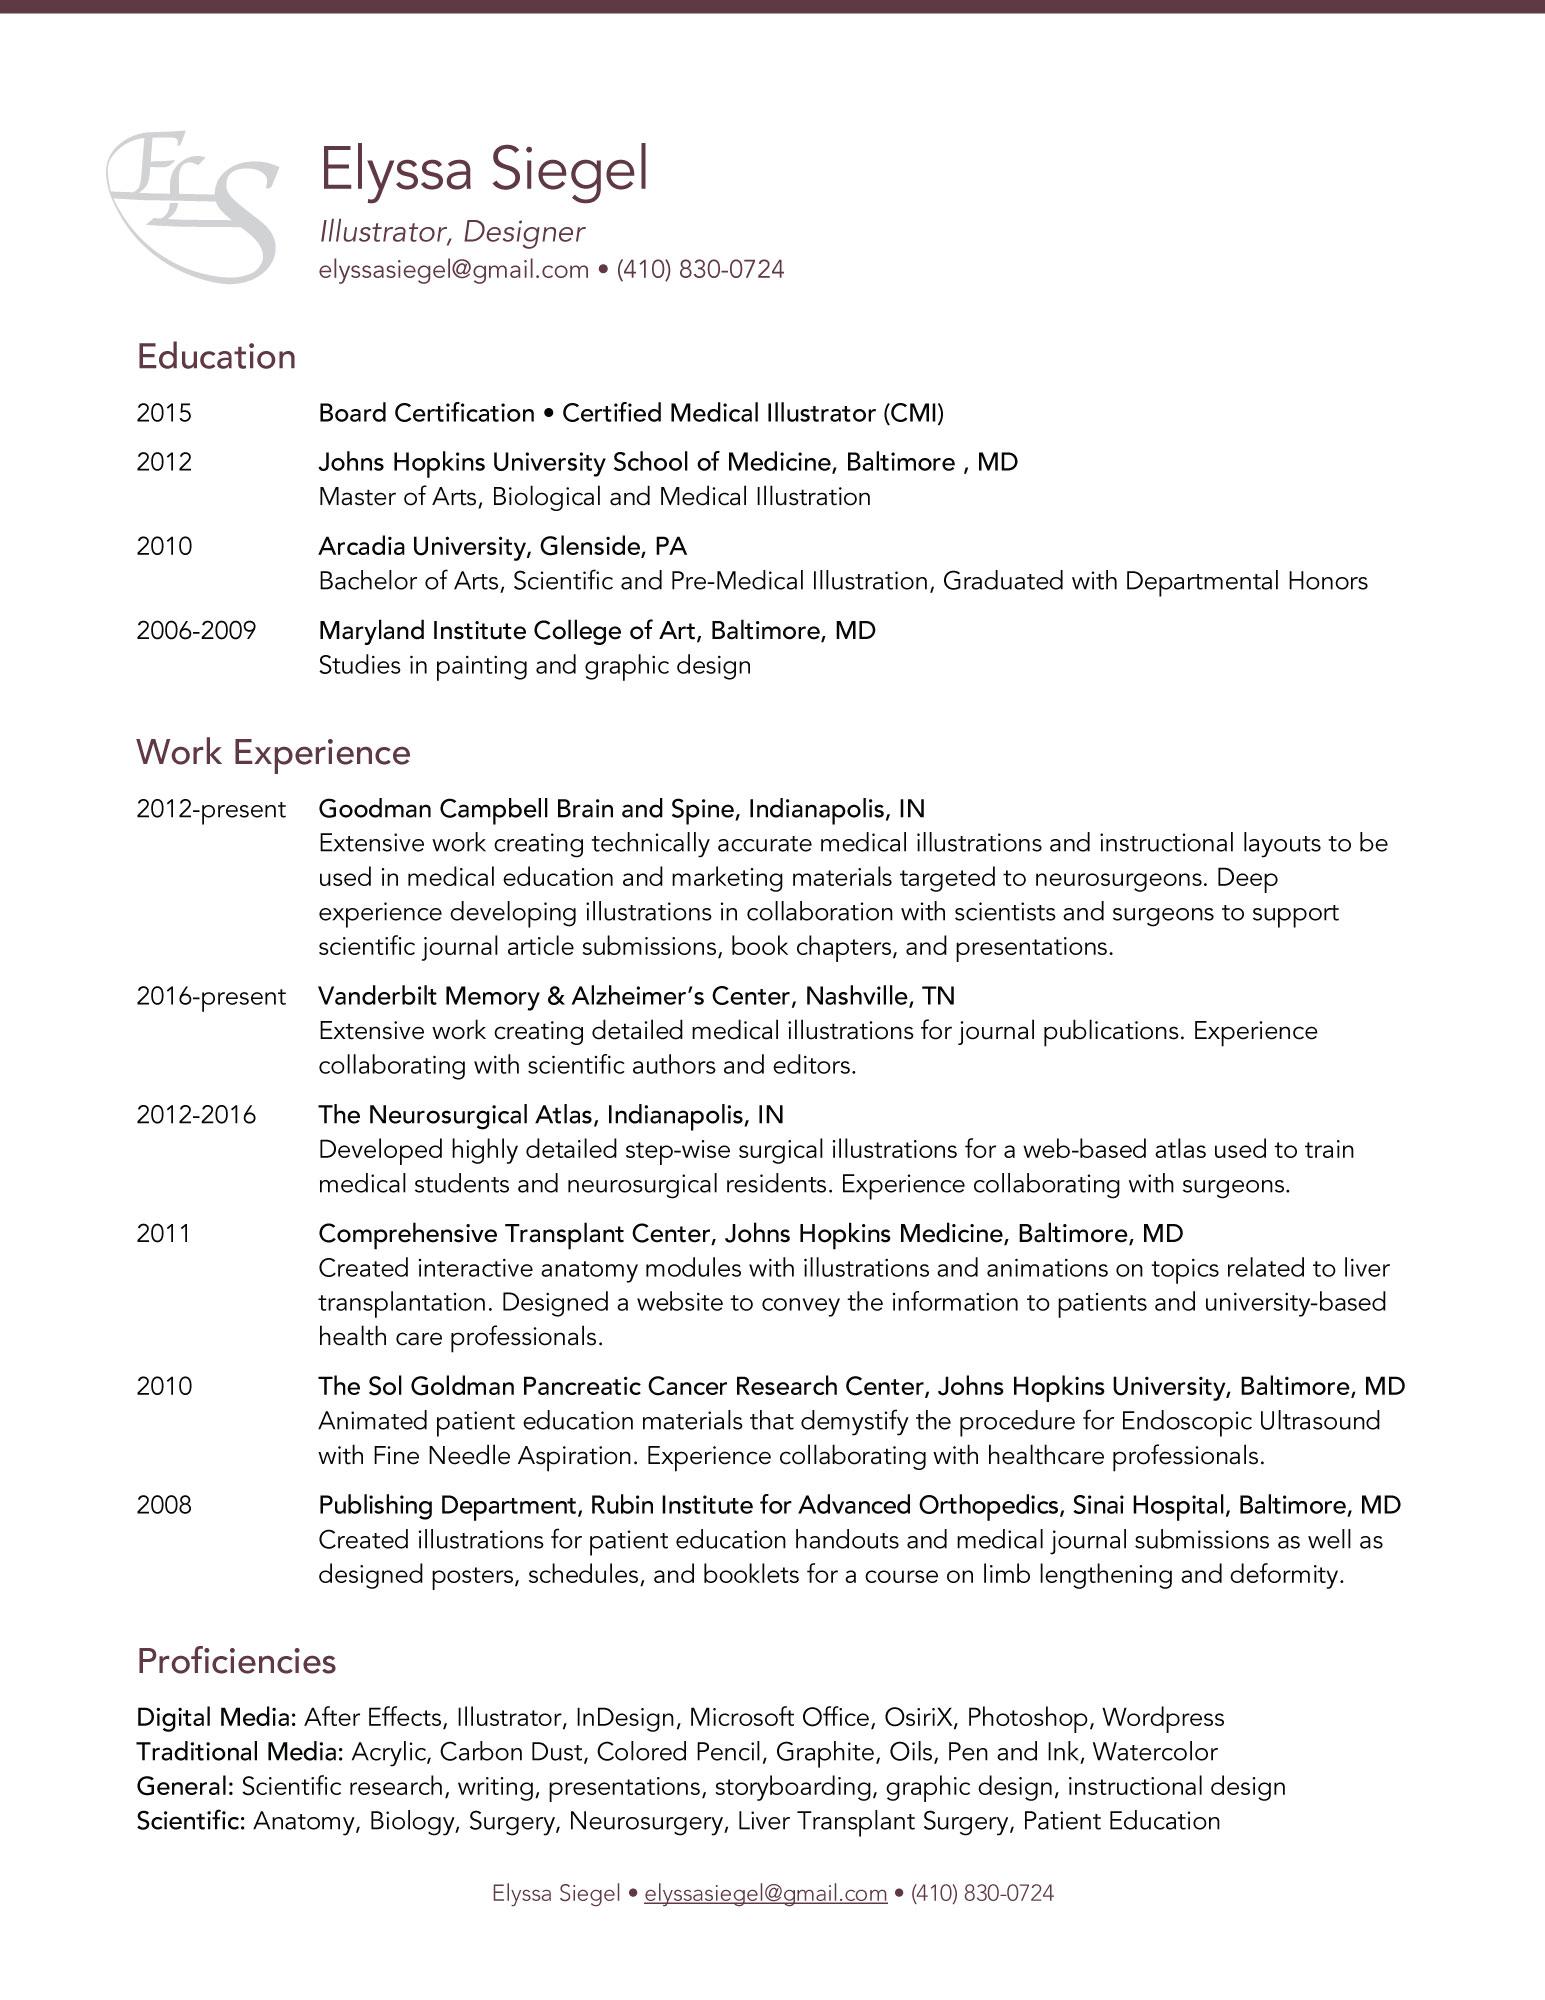 resume_Elyssa-Siegel.jpg